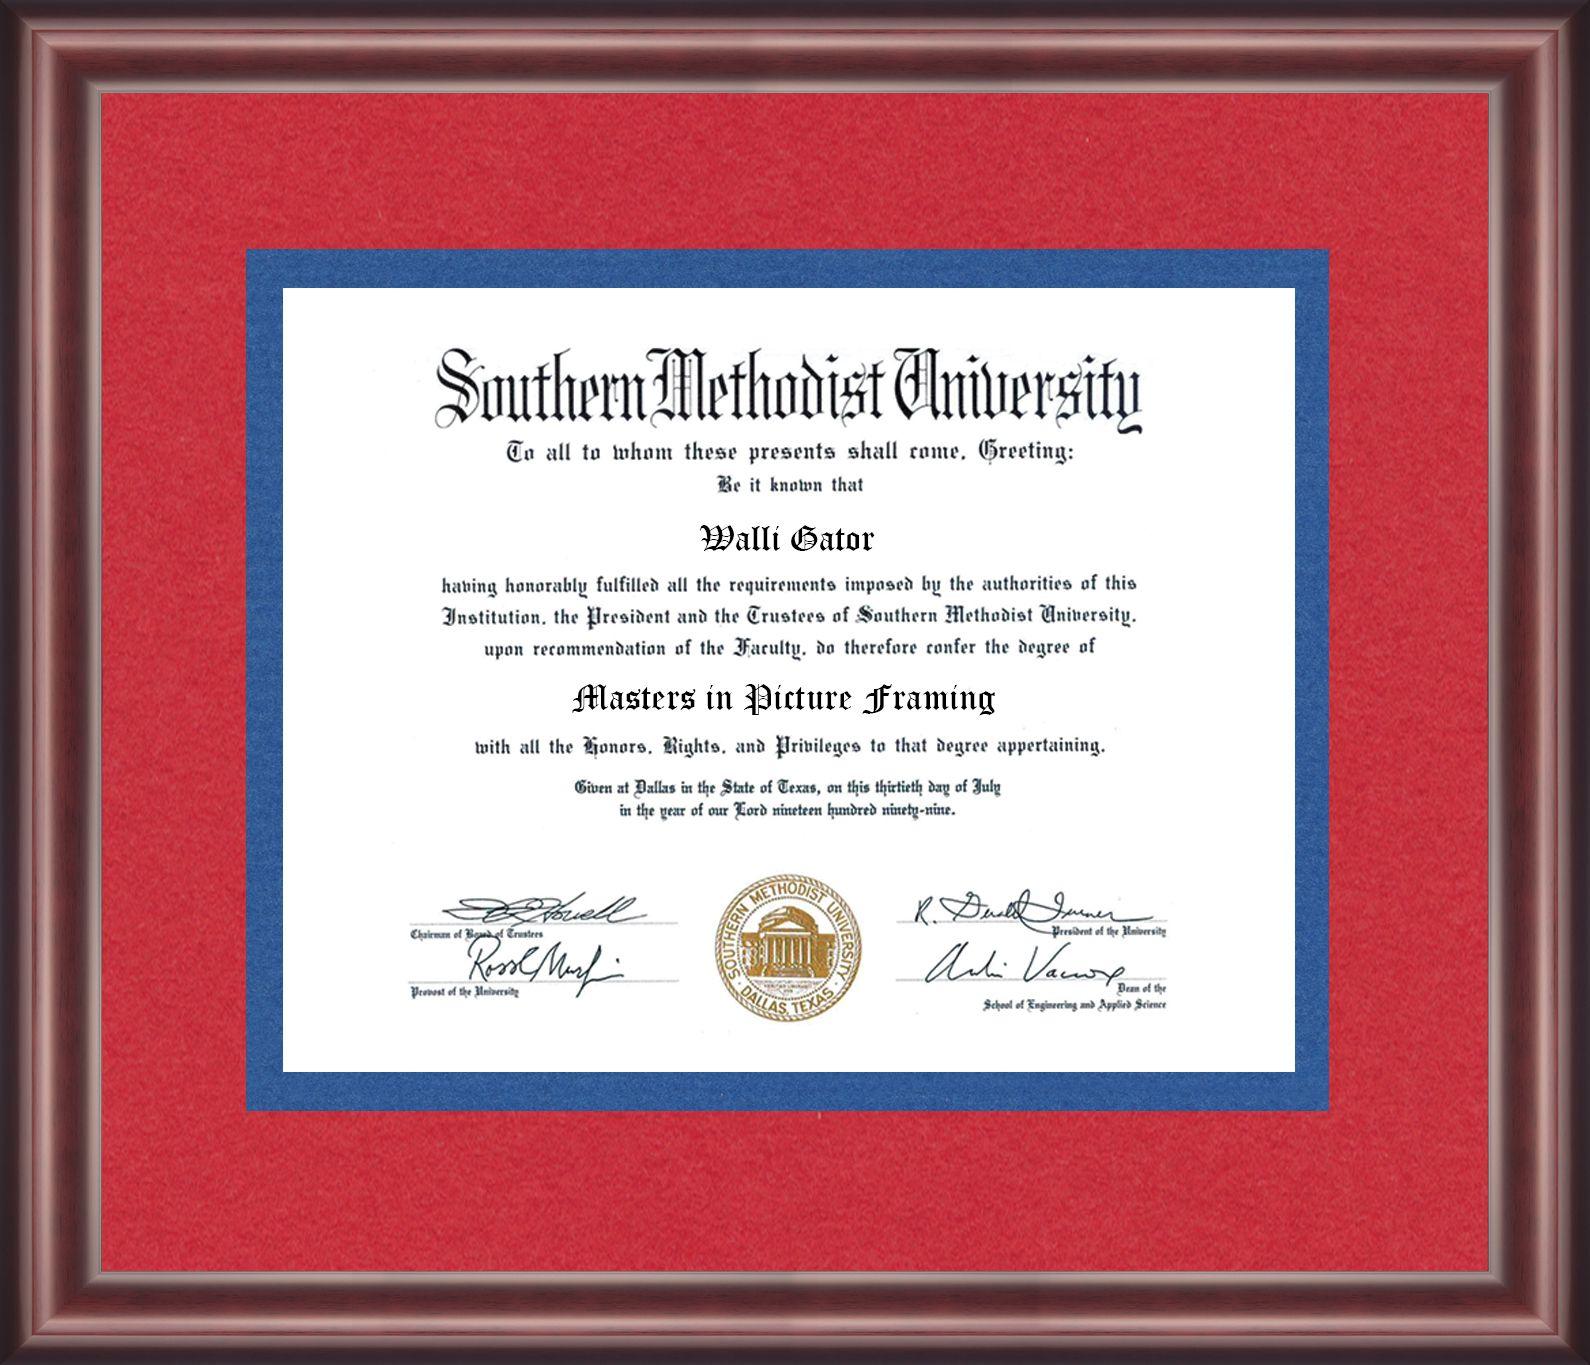 Southern Methodist University Diploma Frame Talking Walls University Diploma Diploma Frame Southern Methodist University